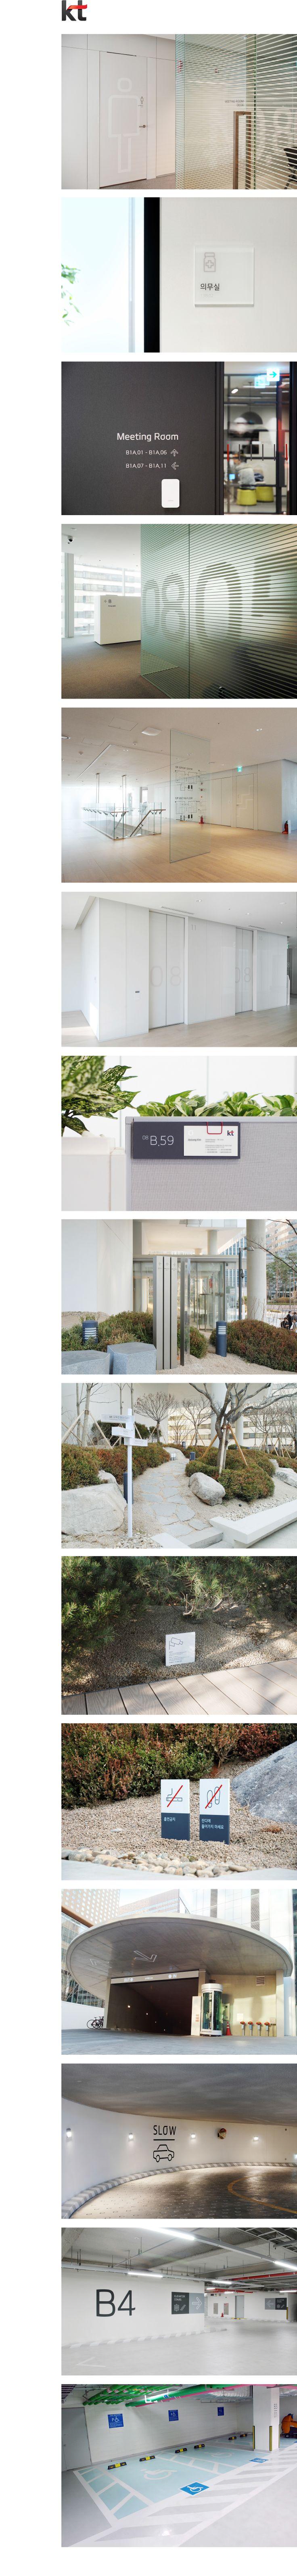 KT Olleh plex Signage Client : KT  http://atelierdesign.kr